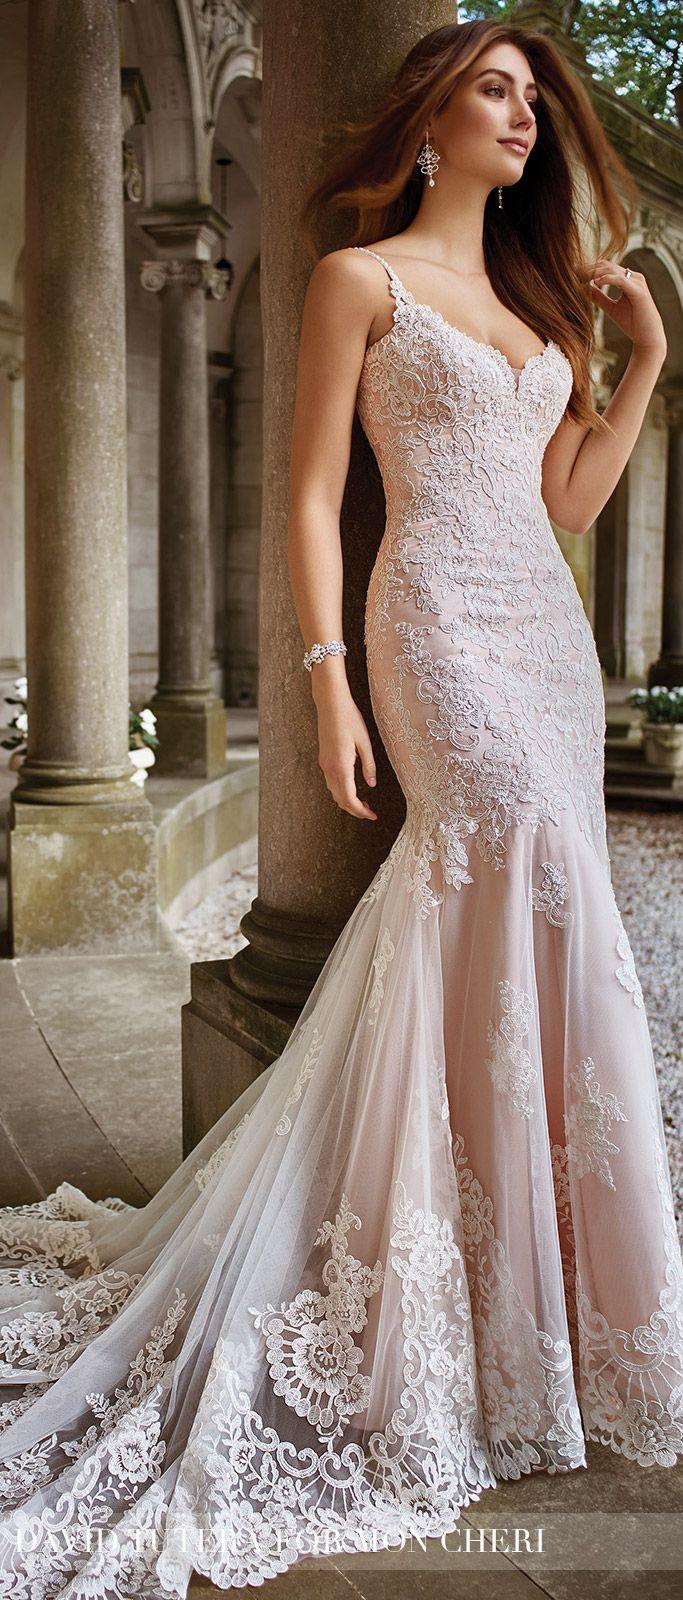 best wedding images on pinterest weddings wedding ideas and